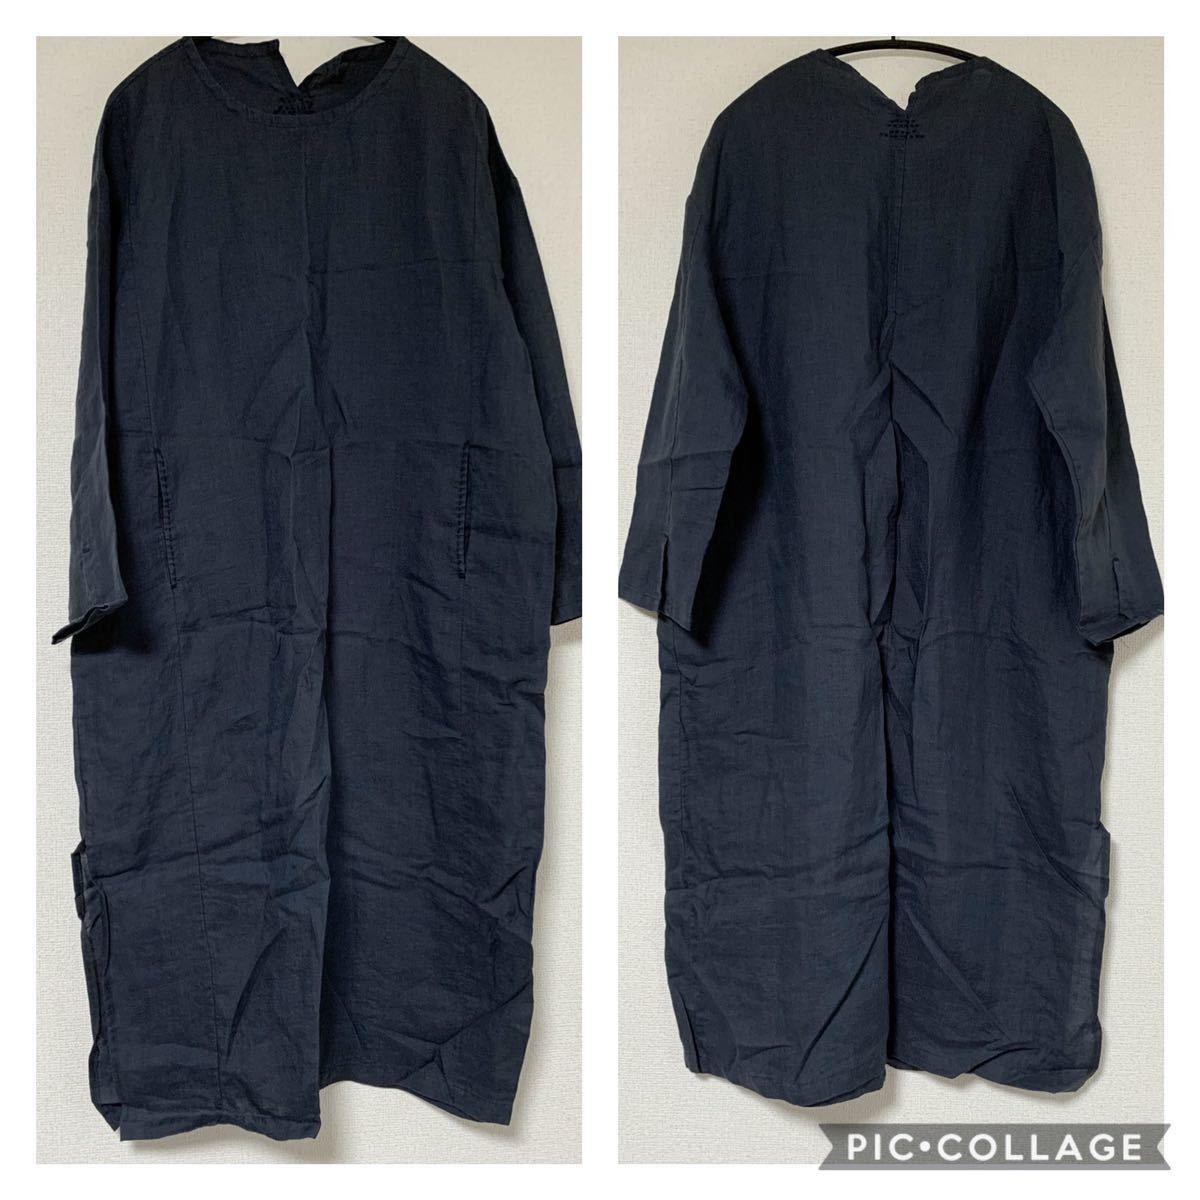 f2 新品 送料無料 レディース リネン100% 麻 長袖 ロングワンピース シンプル ゆったり 秋 冬 ネイビー ナチュラル 刺繍 紺 XL